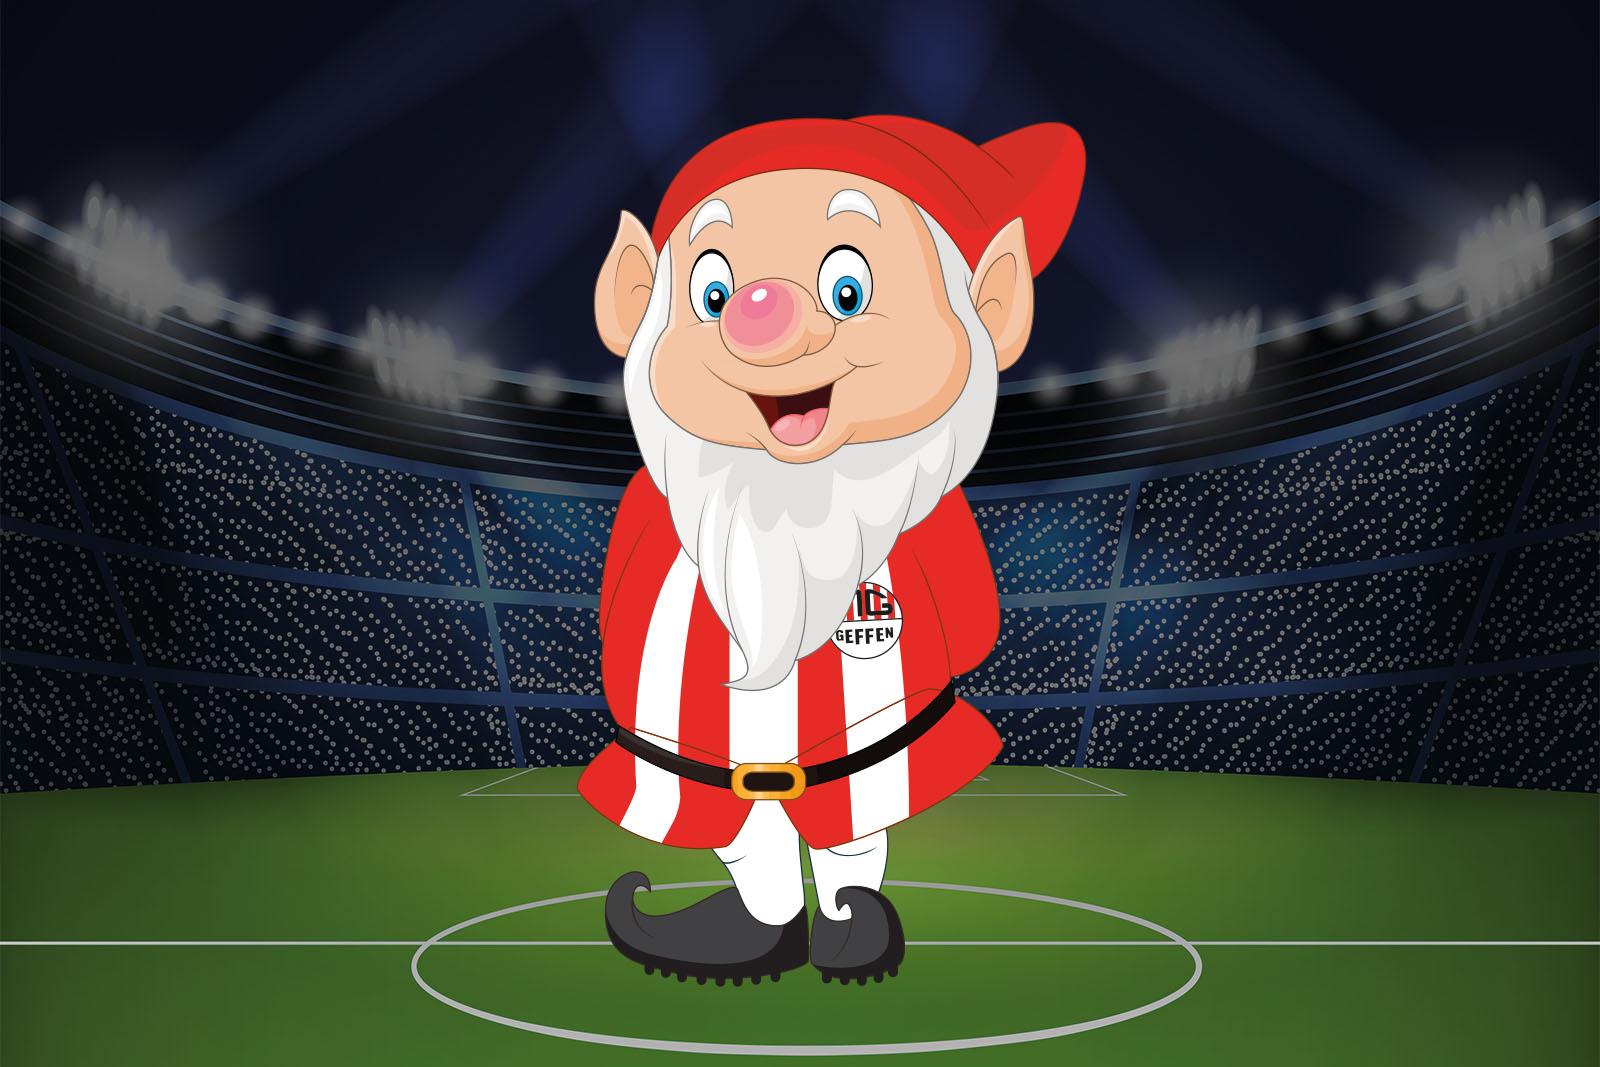 Trainers/spelleiding kaboutervoetbal gezocht!